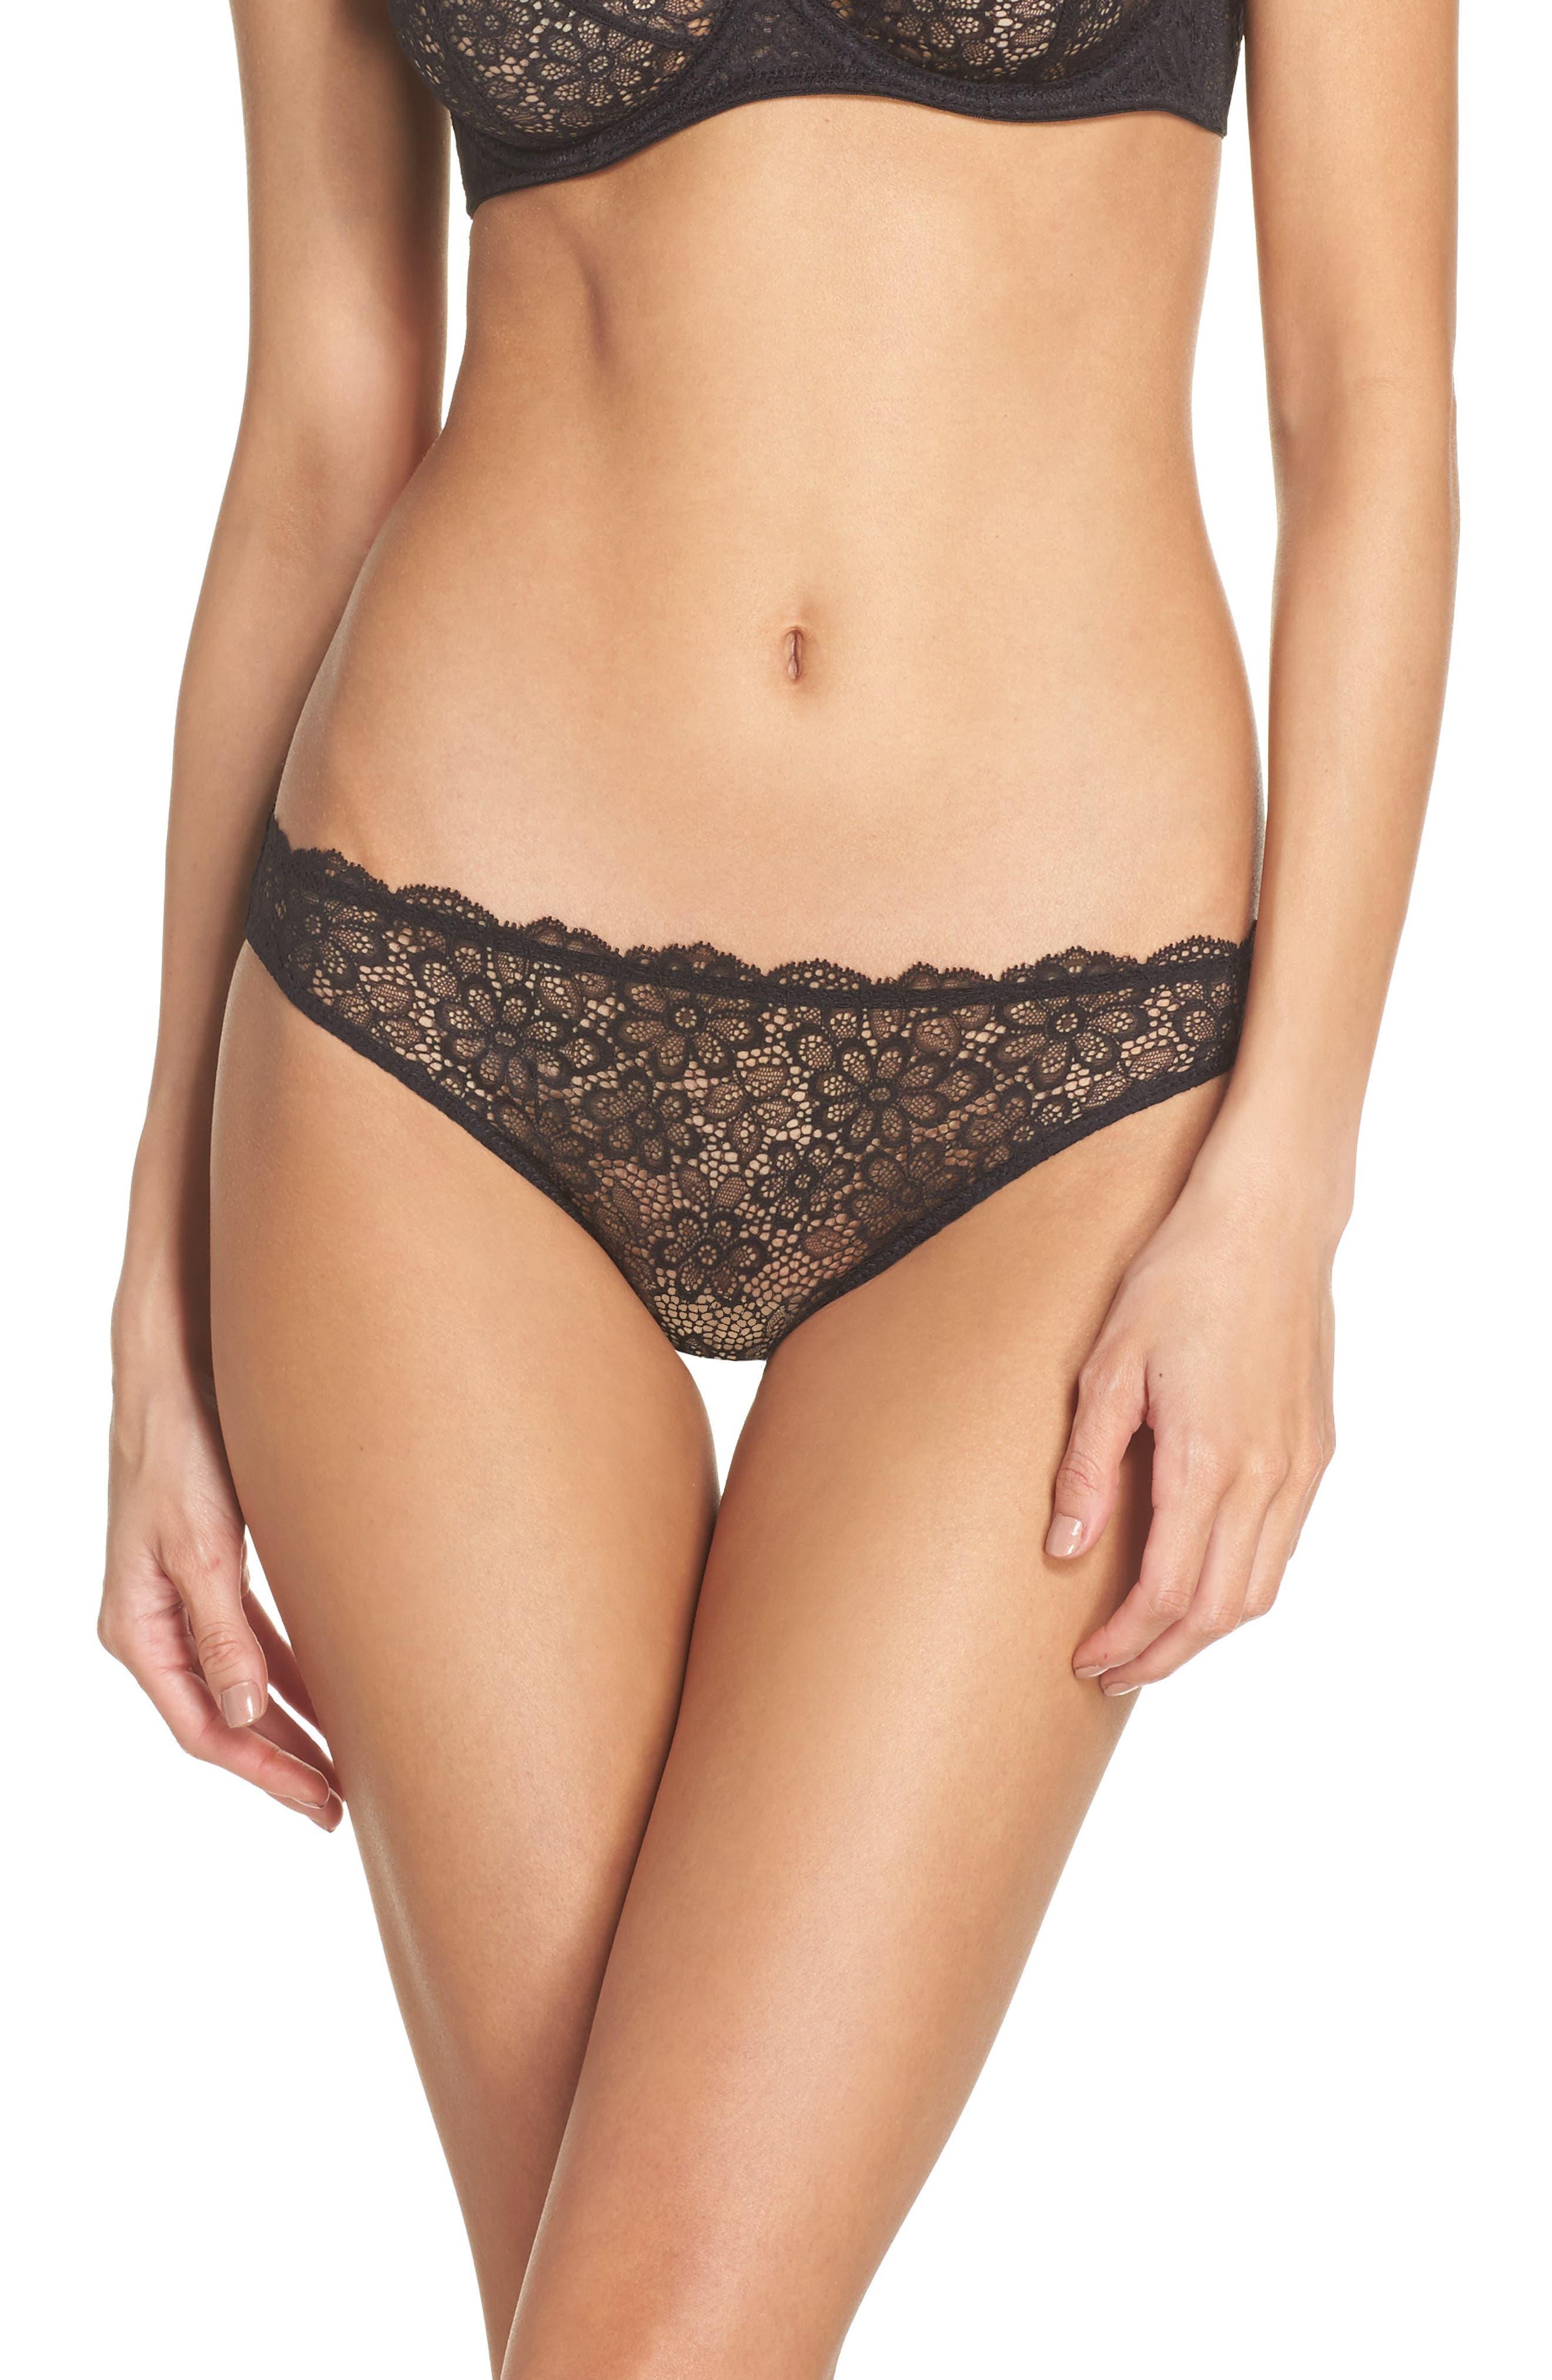 Daisy Lace Panties,                         Main,                         color,